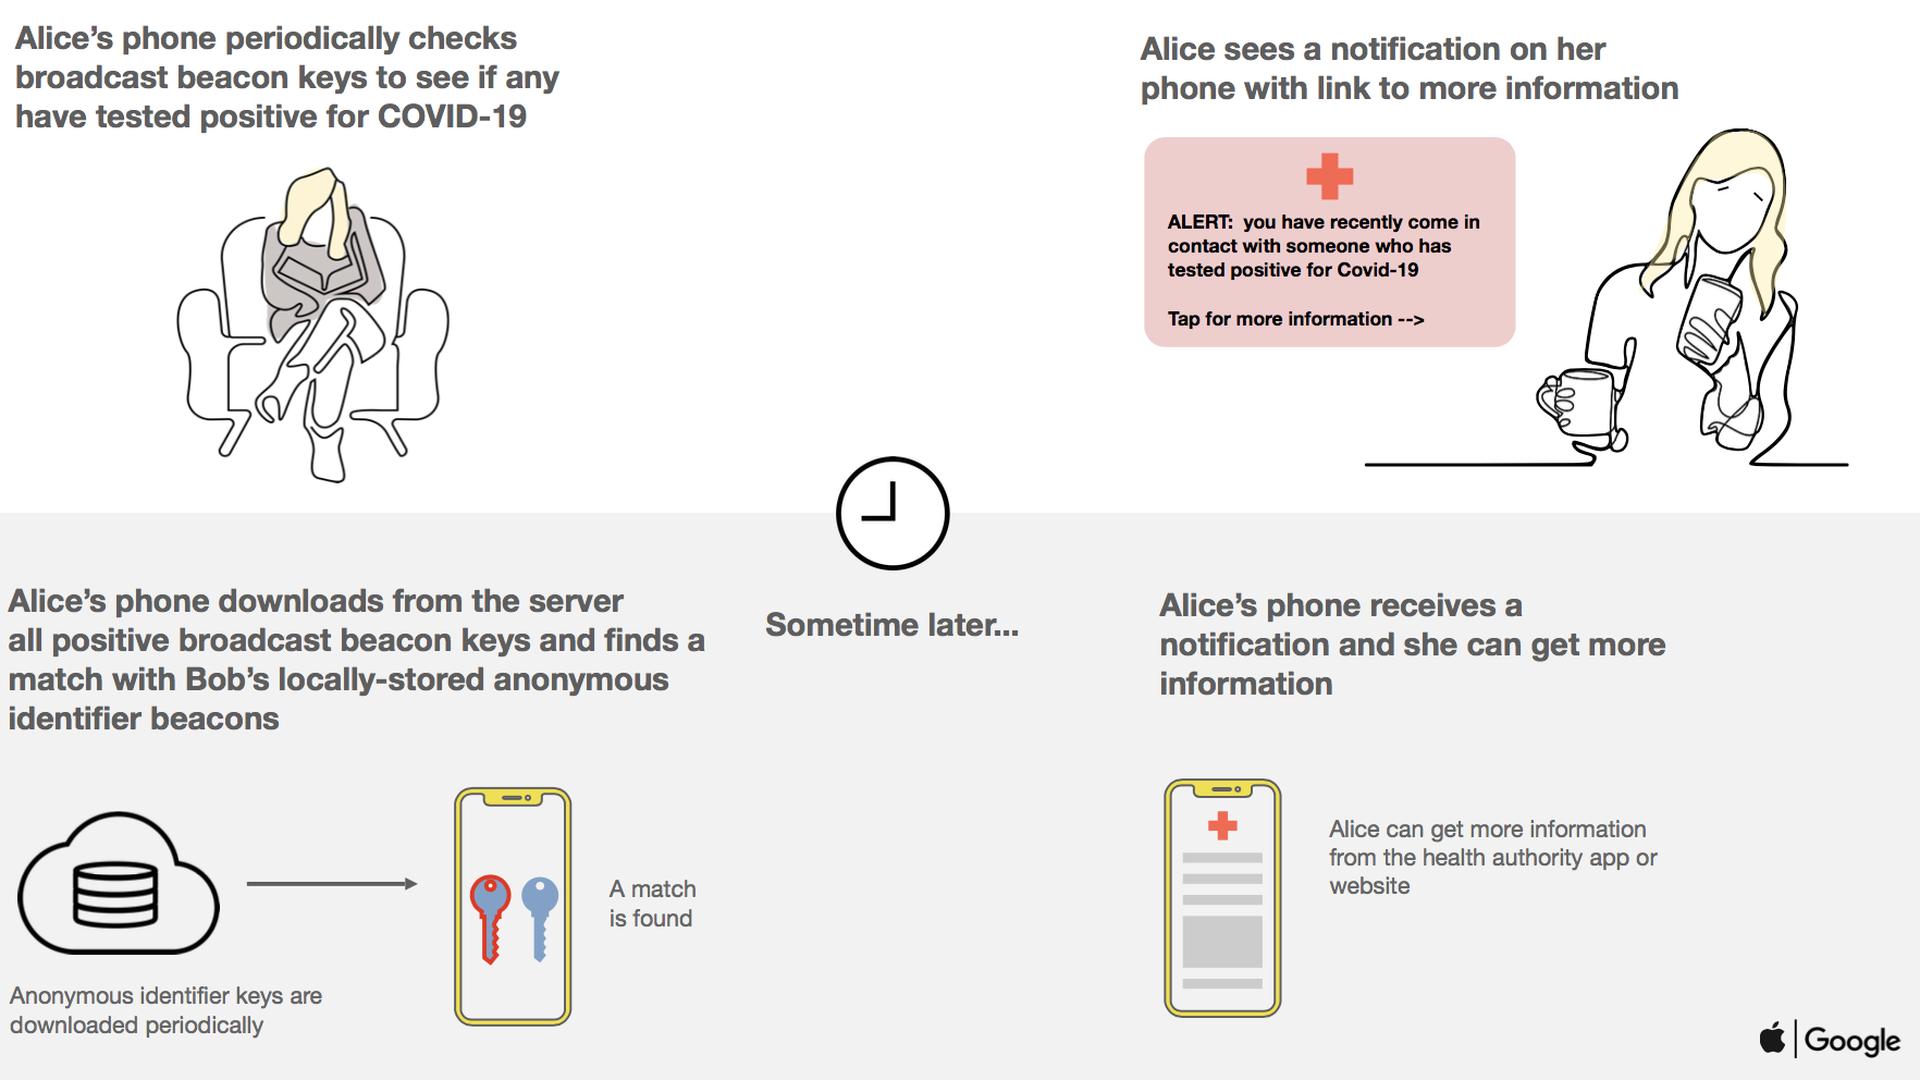 Apple, Google Team Up On Coronavirus Contact Tracing - Axios